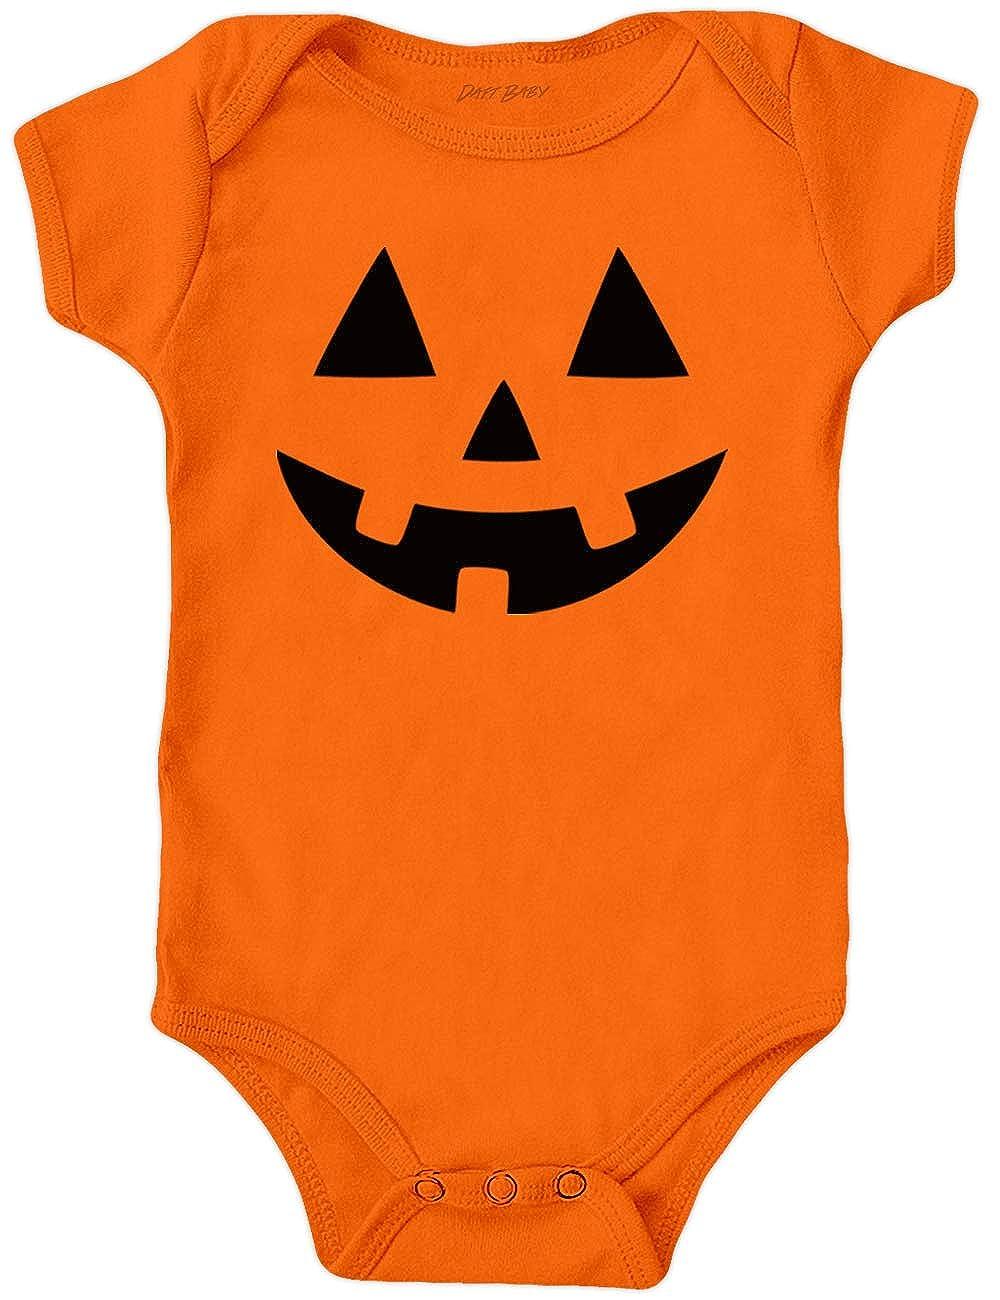 Babys First Halloween Costume Bodysuits, Jack O' Lantern, Pumpkin Face, Rib Cage Clothes Jack O' Lantern